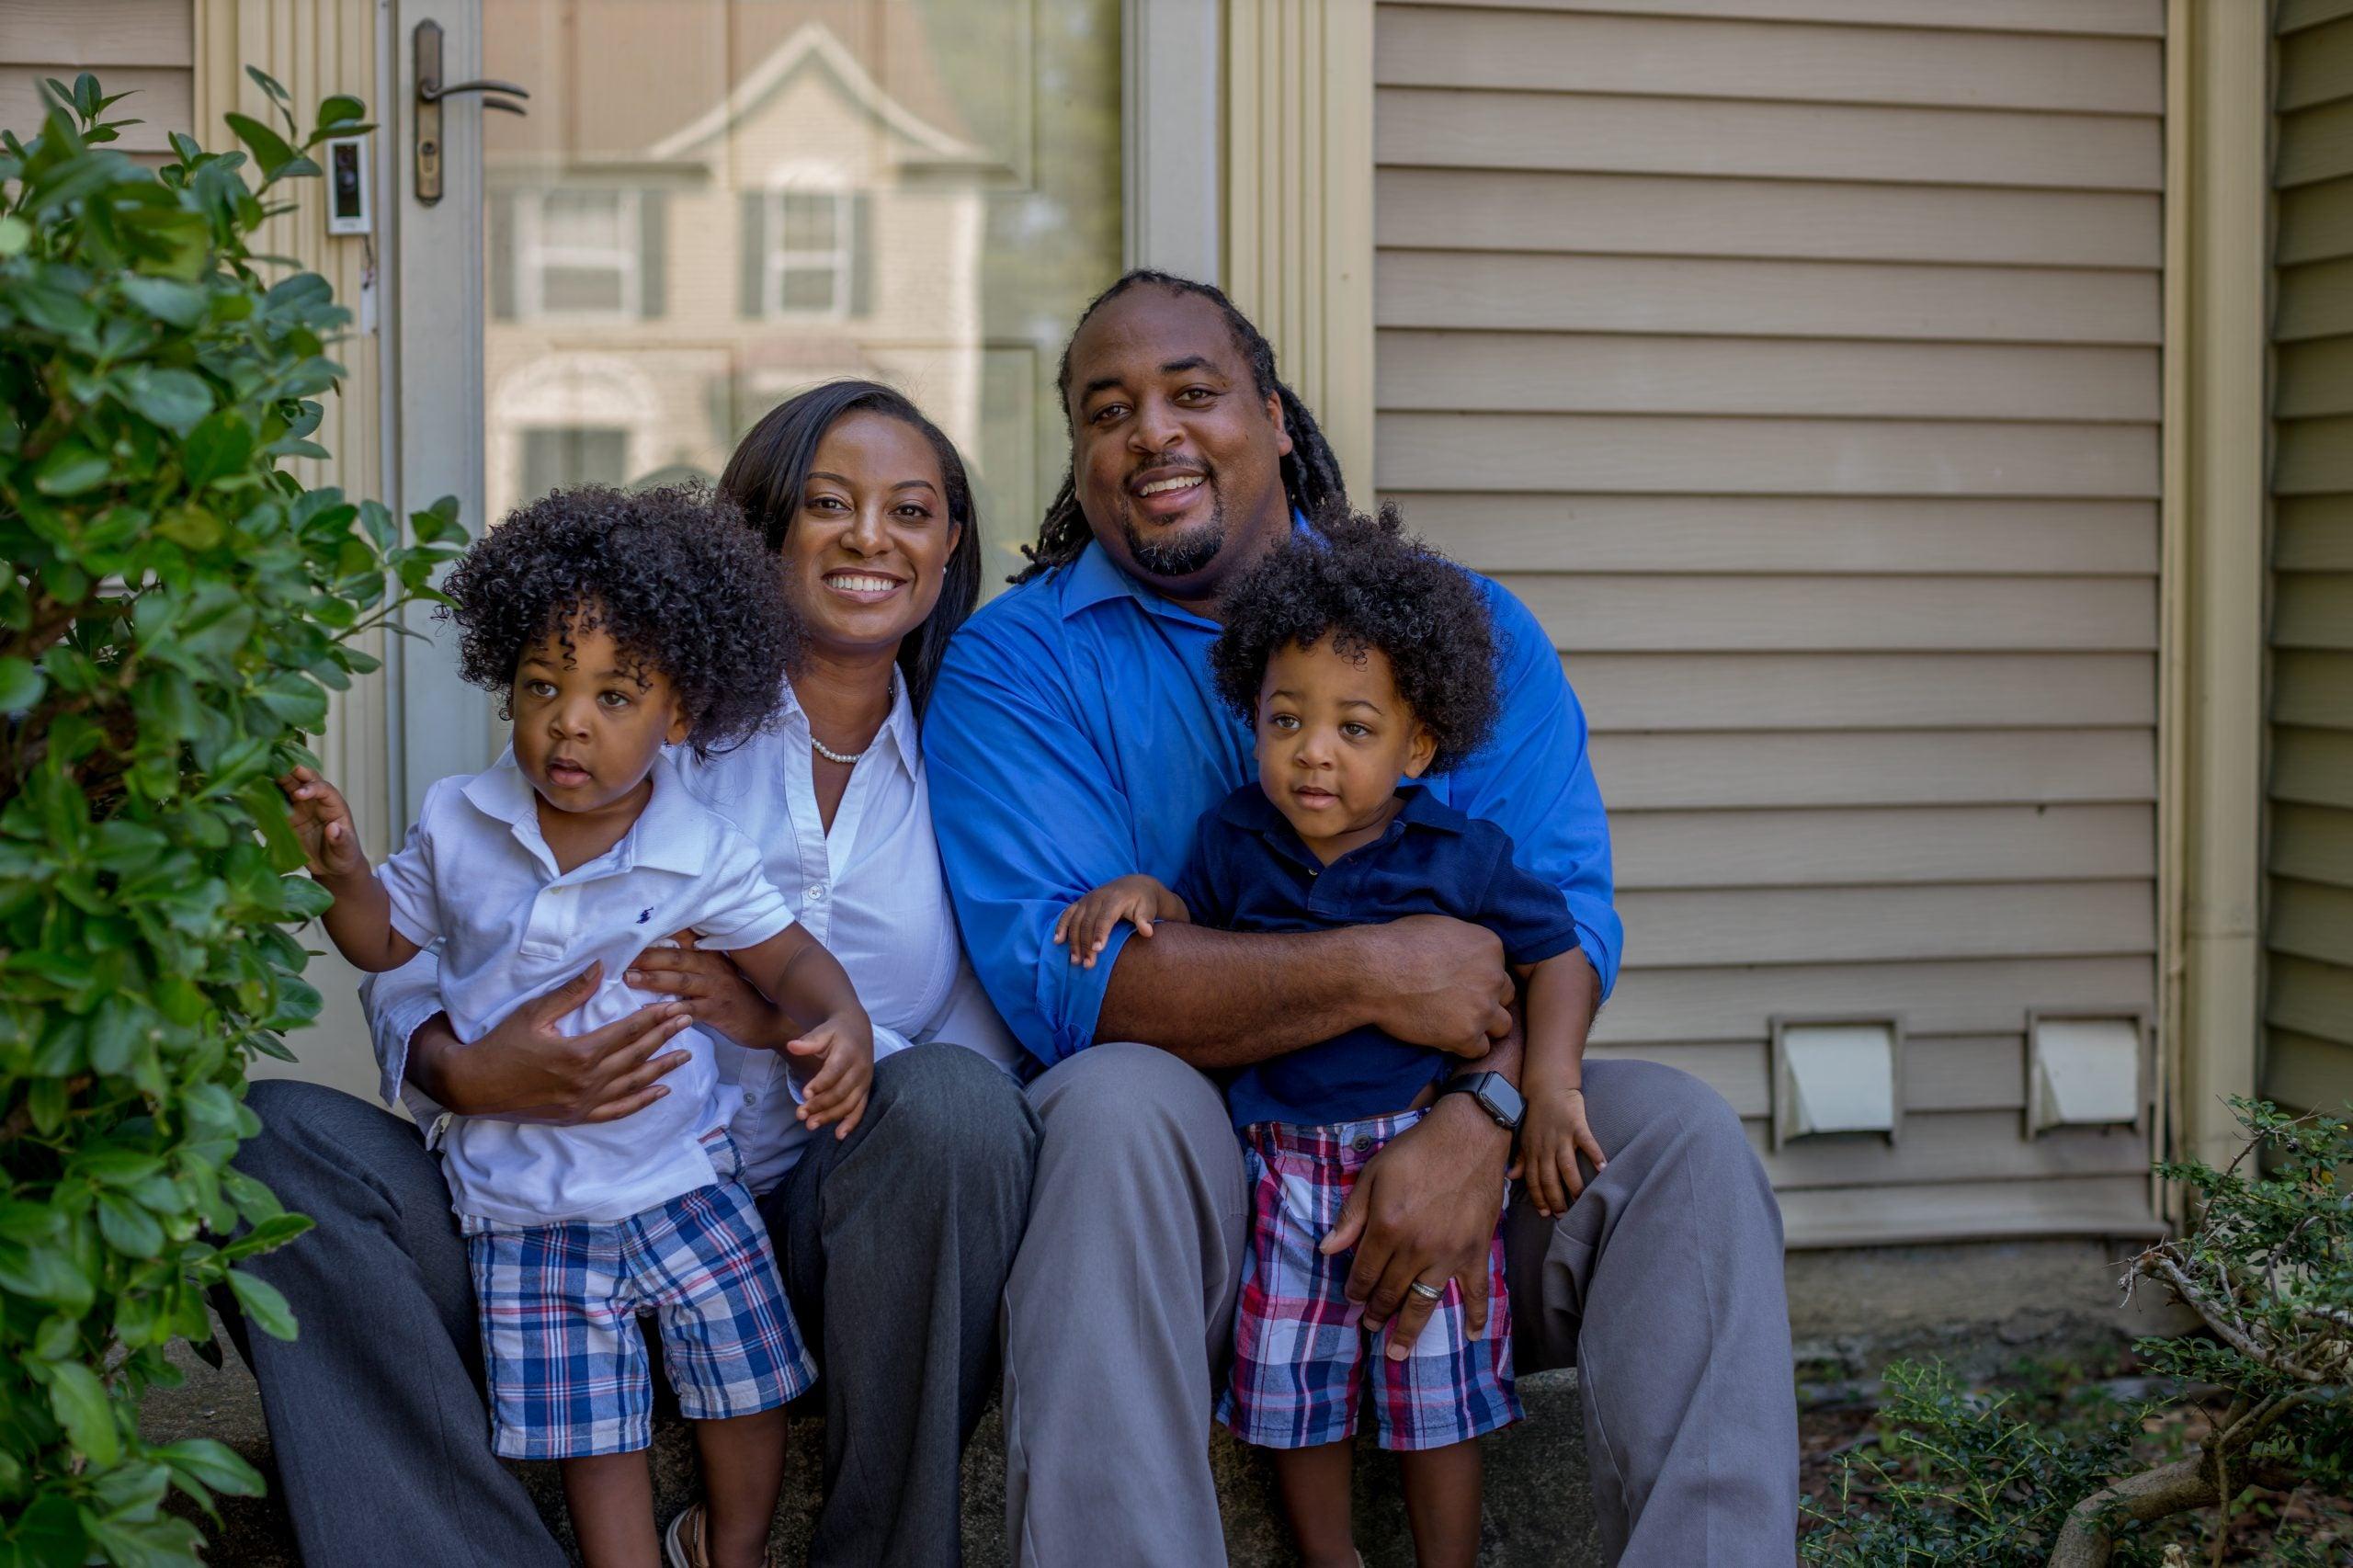 Jennifer Carroll Foy with family